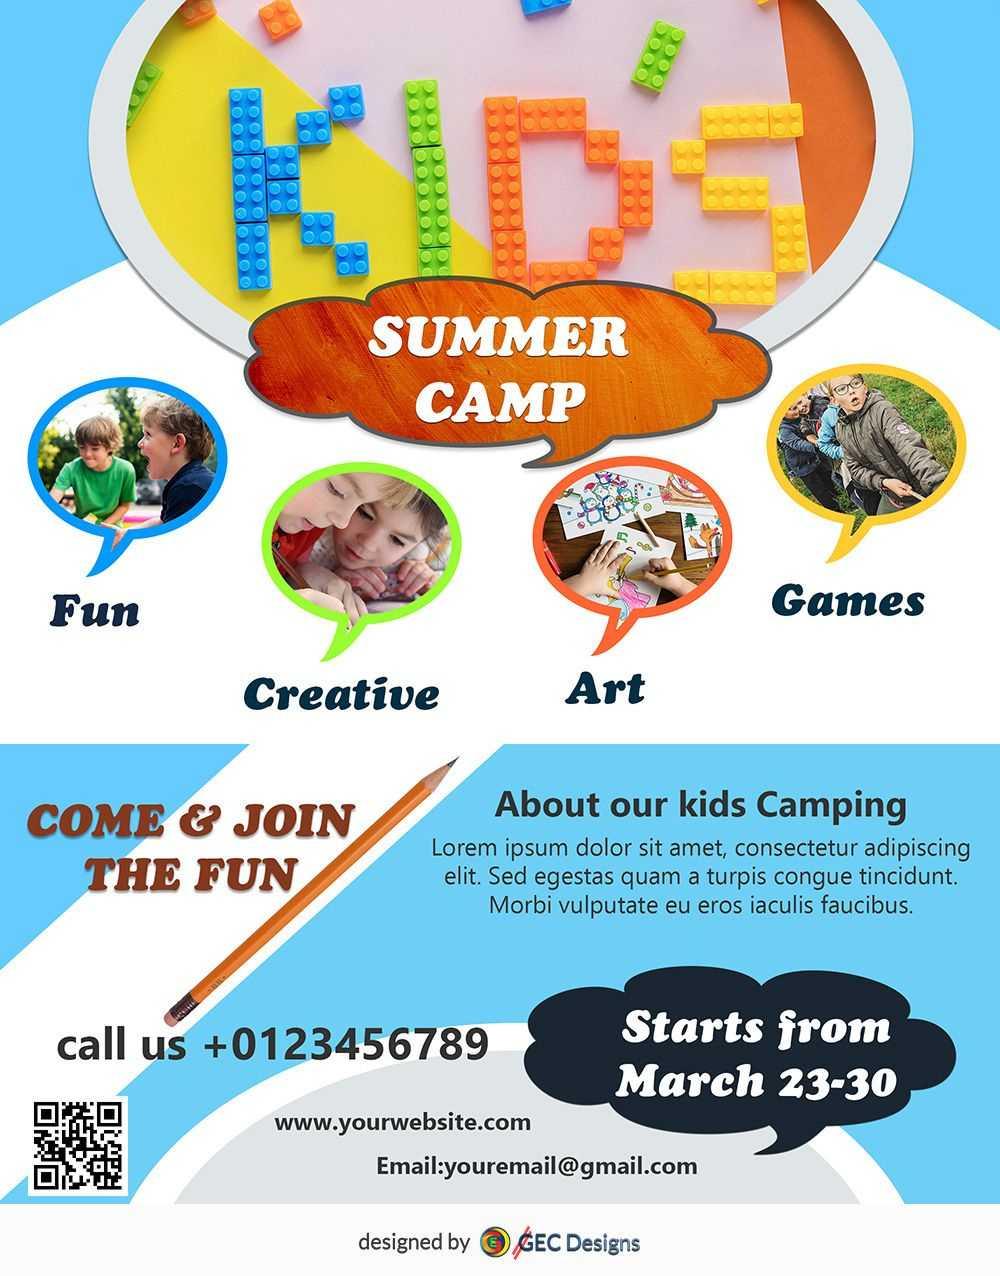 Download Free Flyer Templates | Flyer Design Inspiration Regarding Summer Camp Brochure Template Free Download